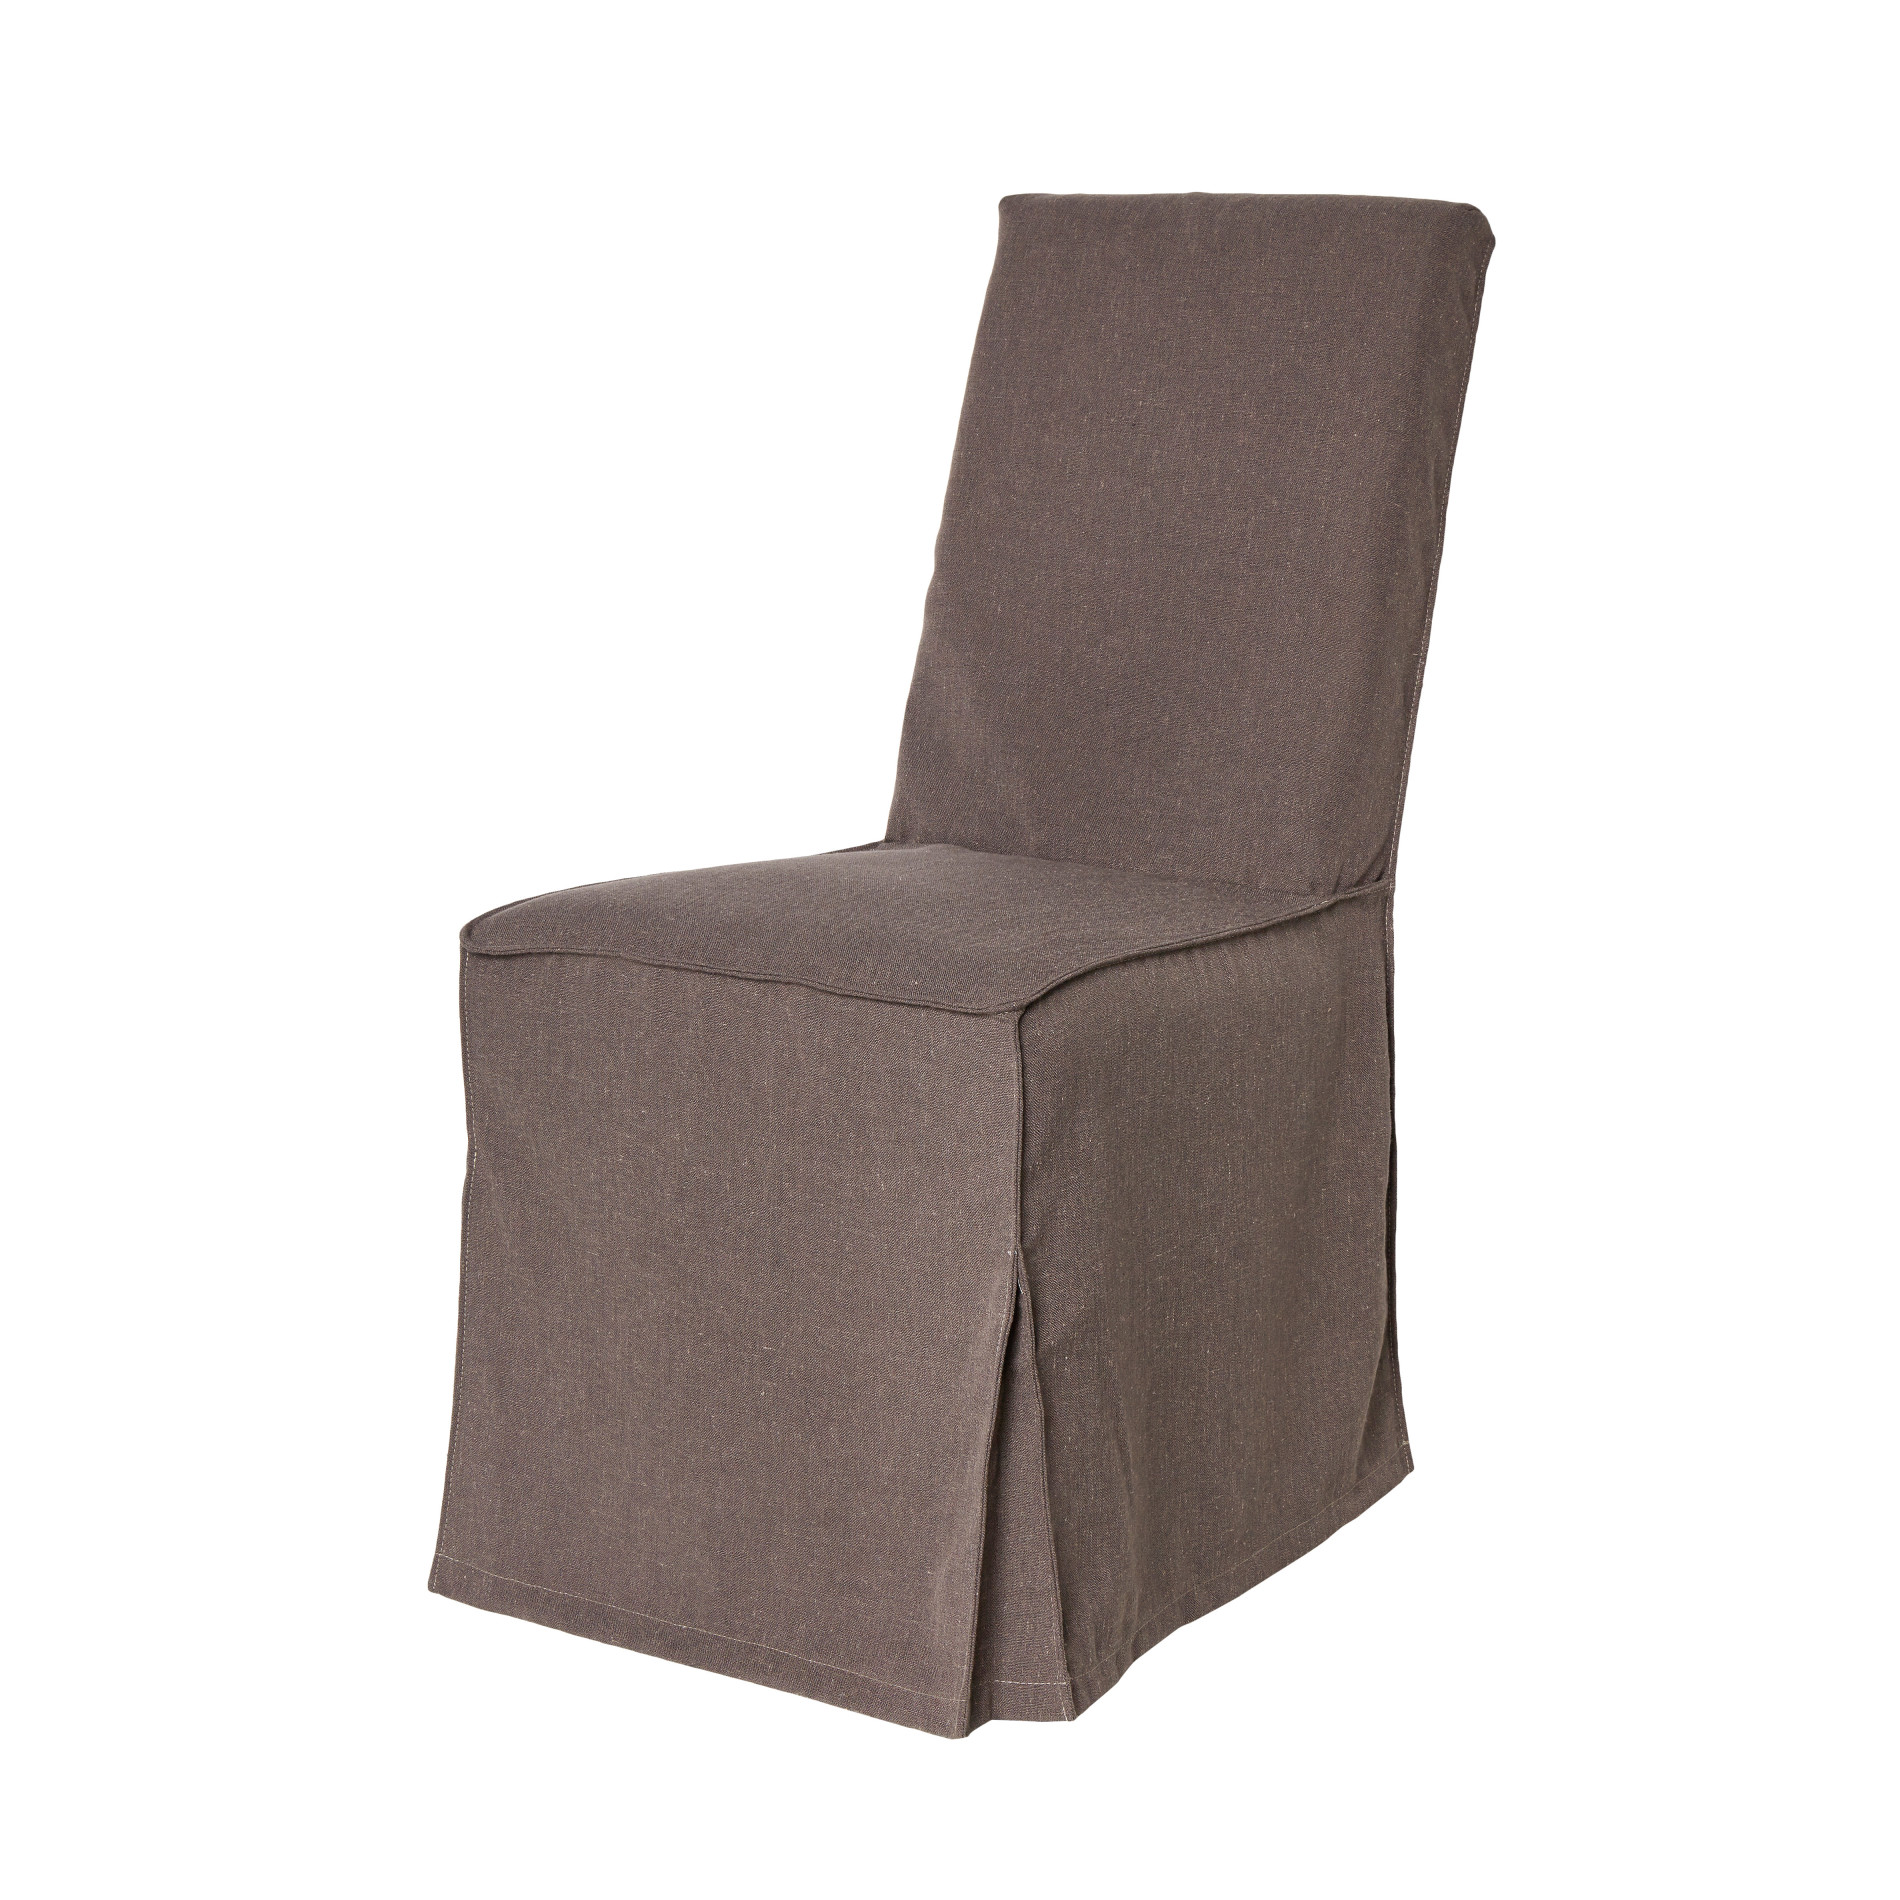 Rivestimento lungo per sedie mery coincasa for Rivestimento sedie